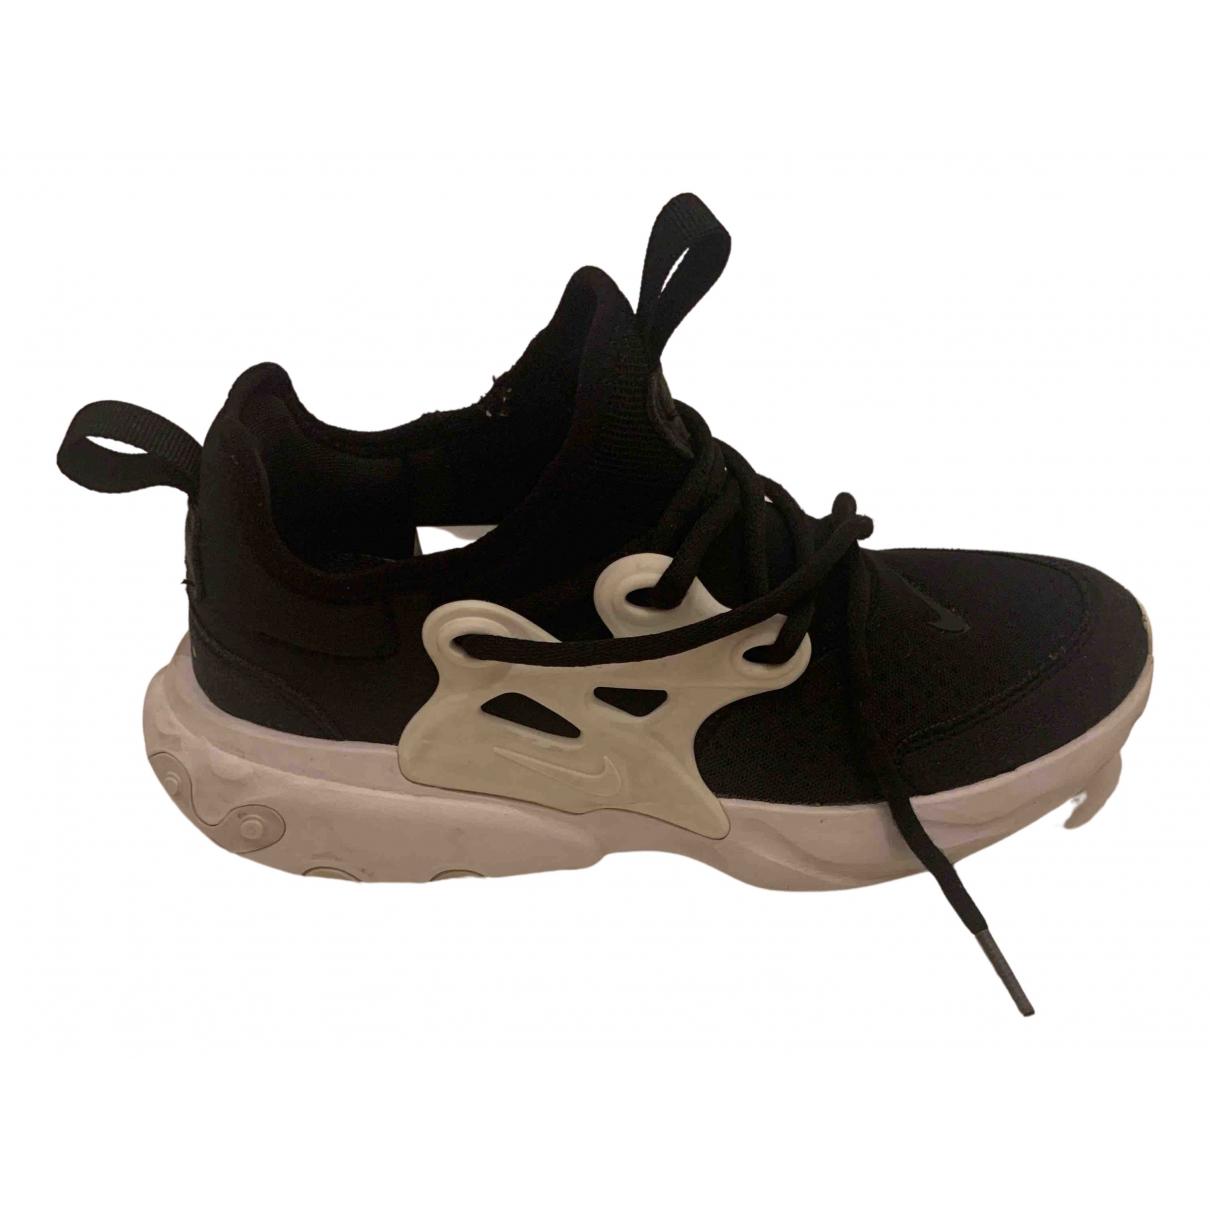 Nike Air Presto Black Trainers for Kids 2 UK